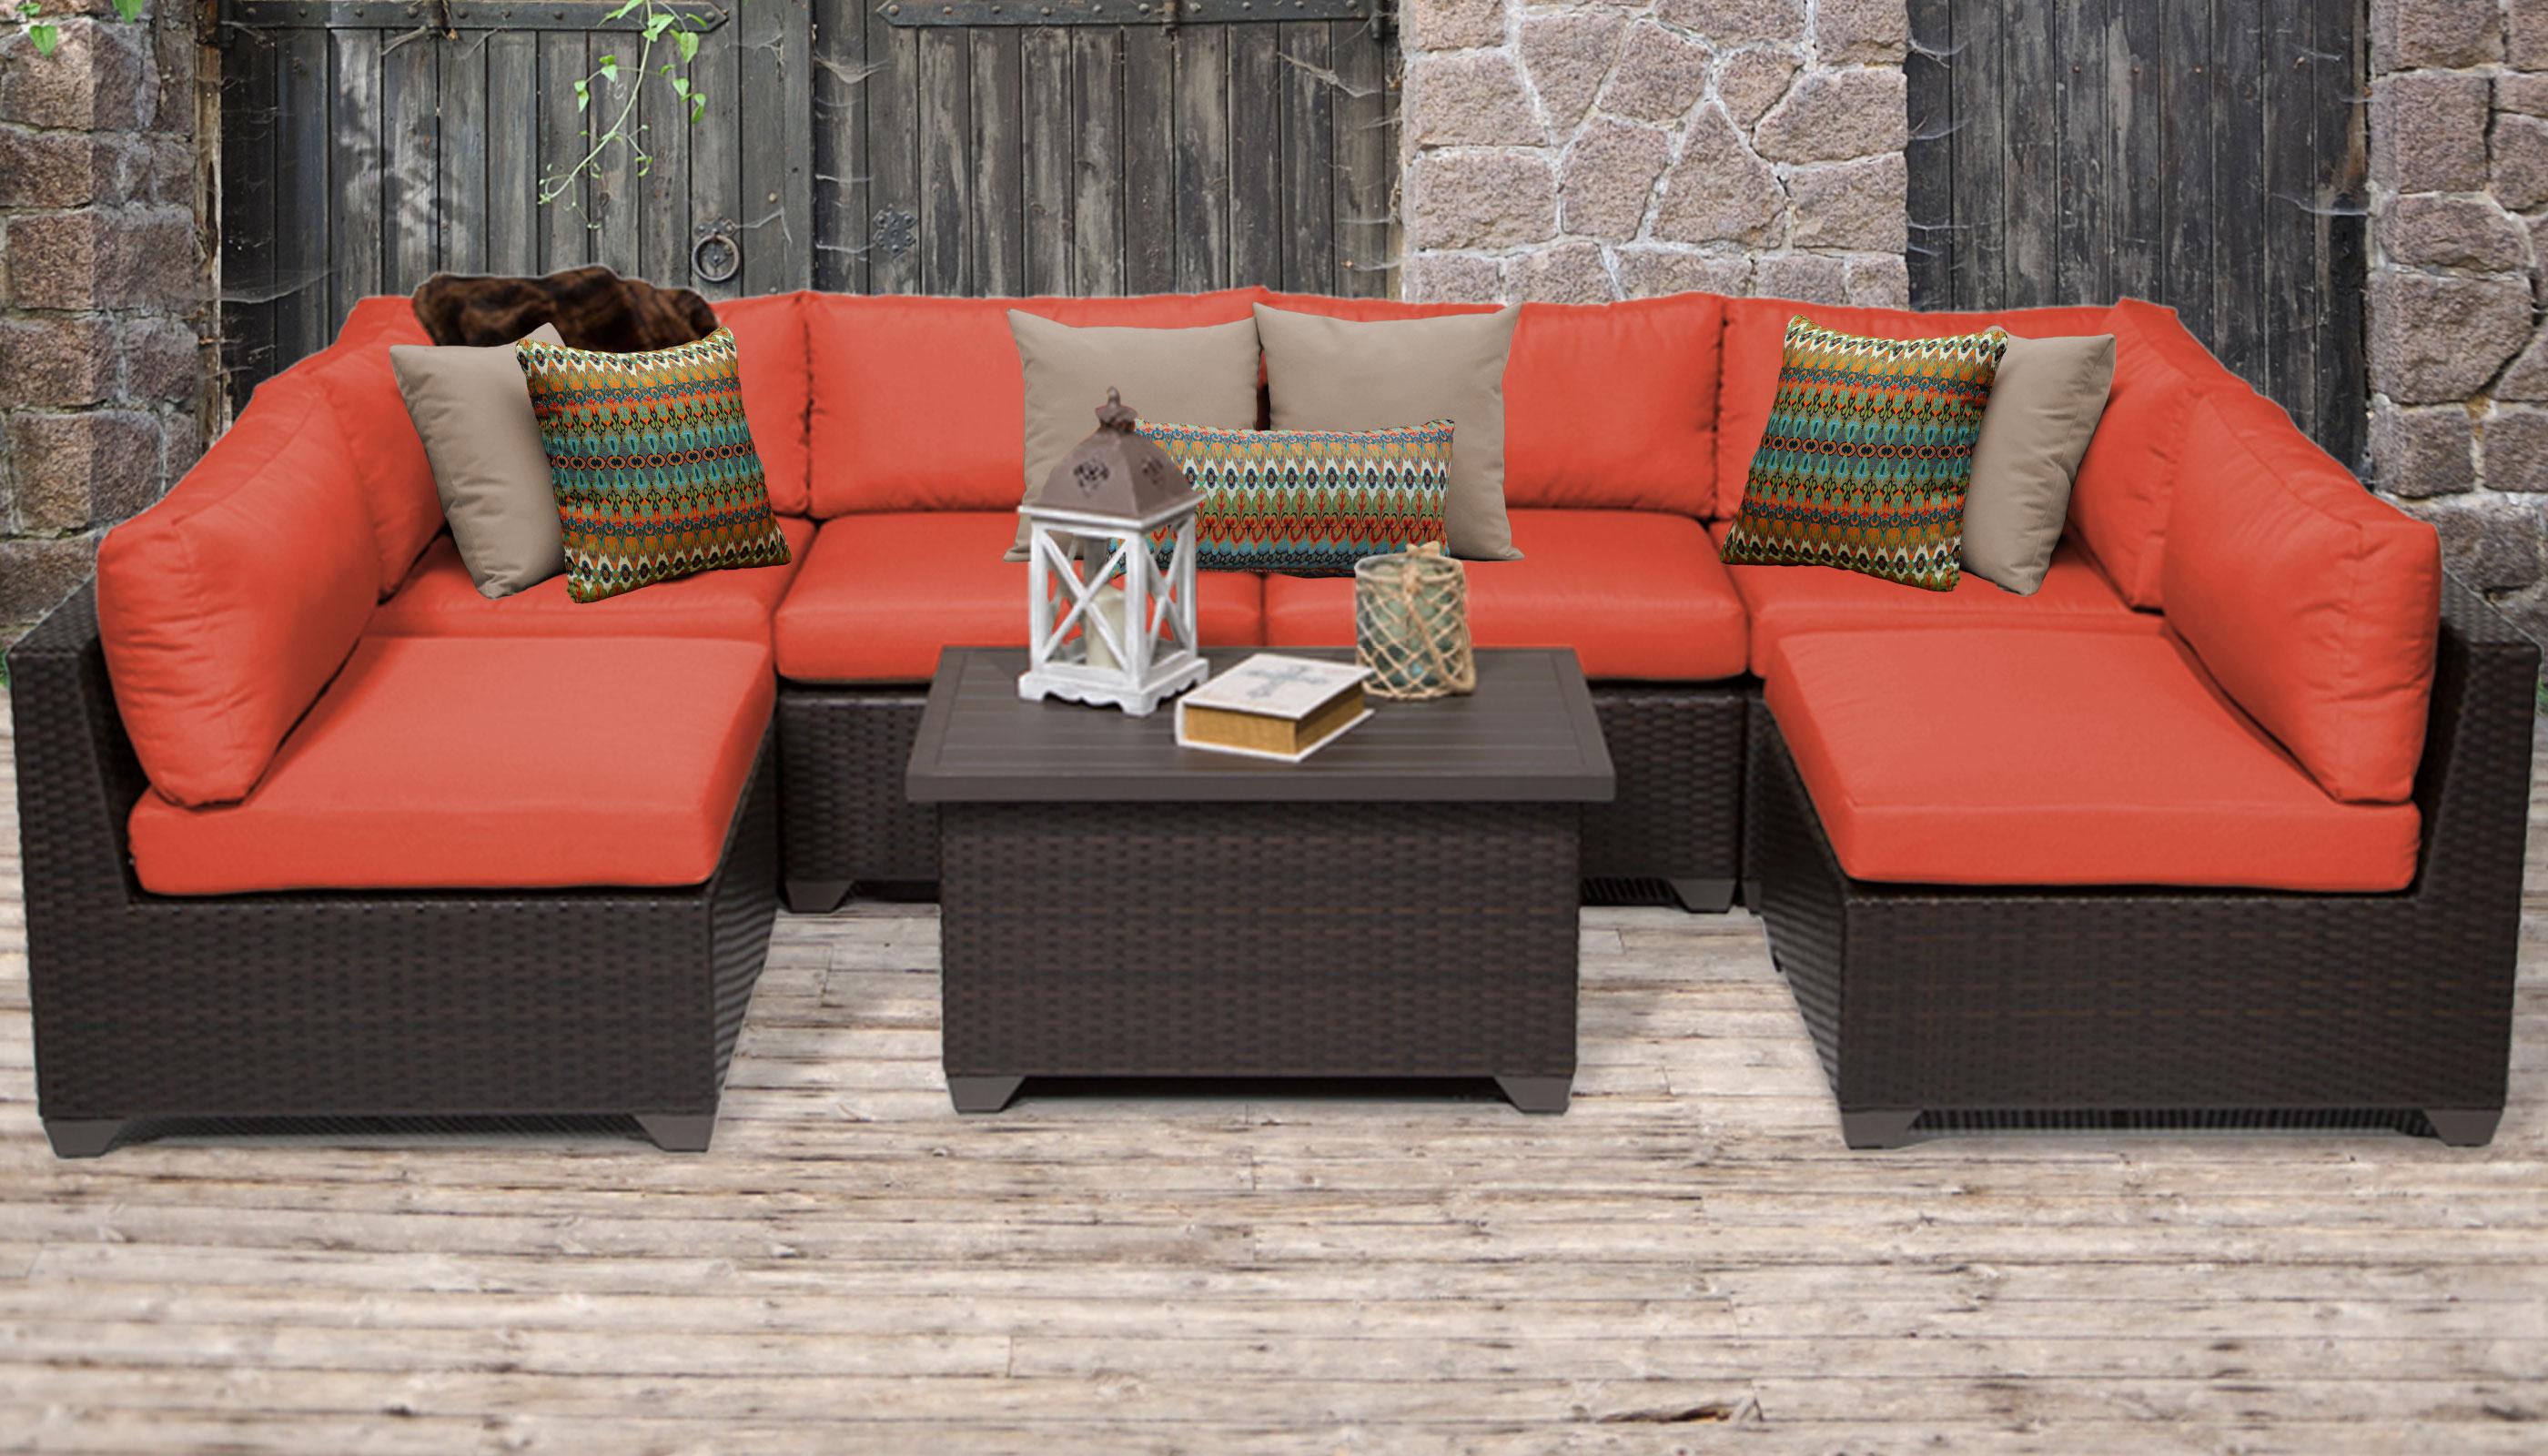 Belle 7 Piece Outdoor Wicker Patio Furniture Set 07a